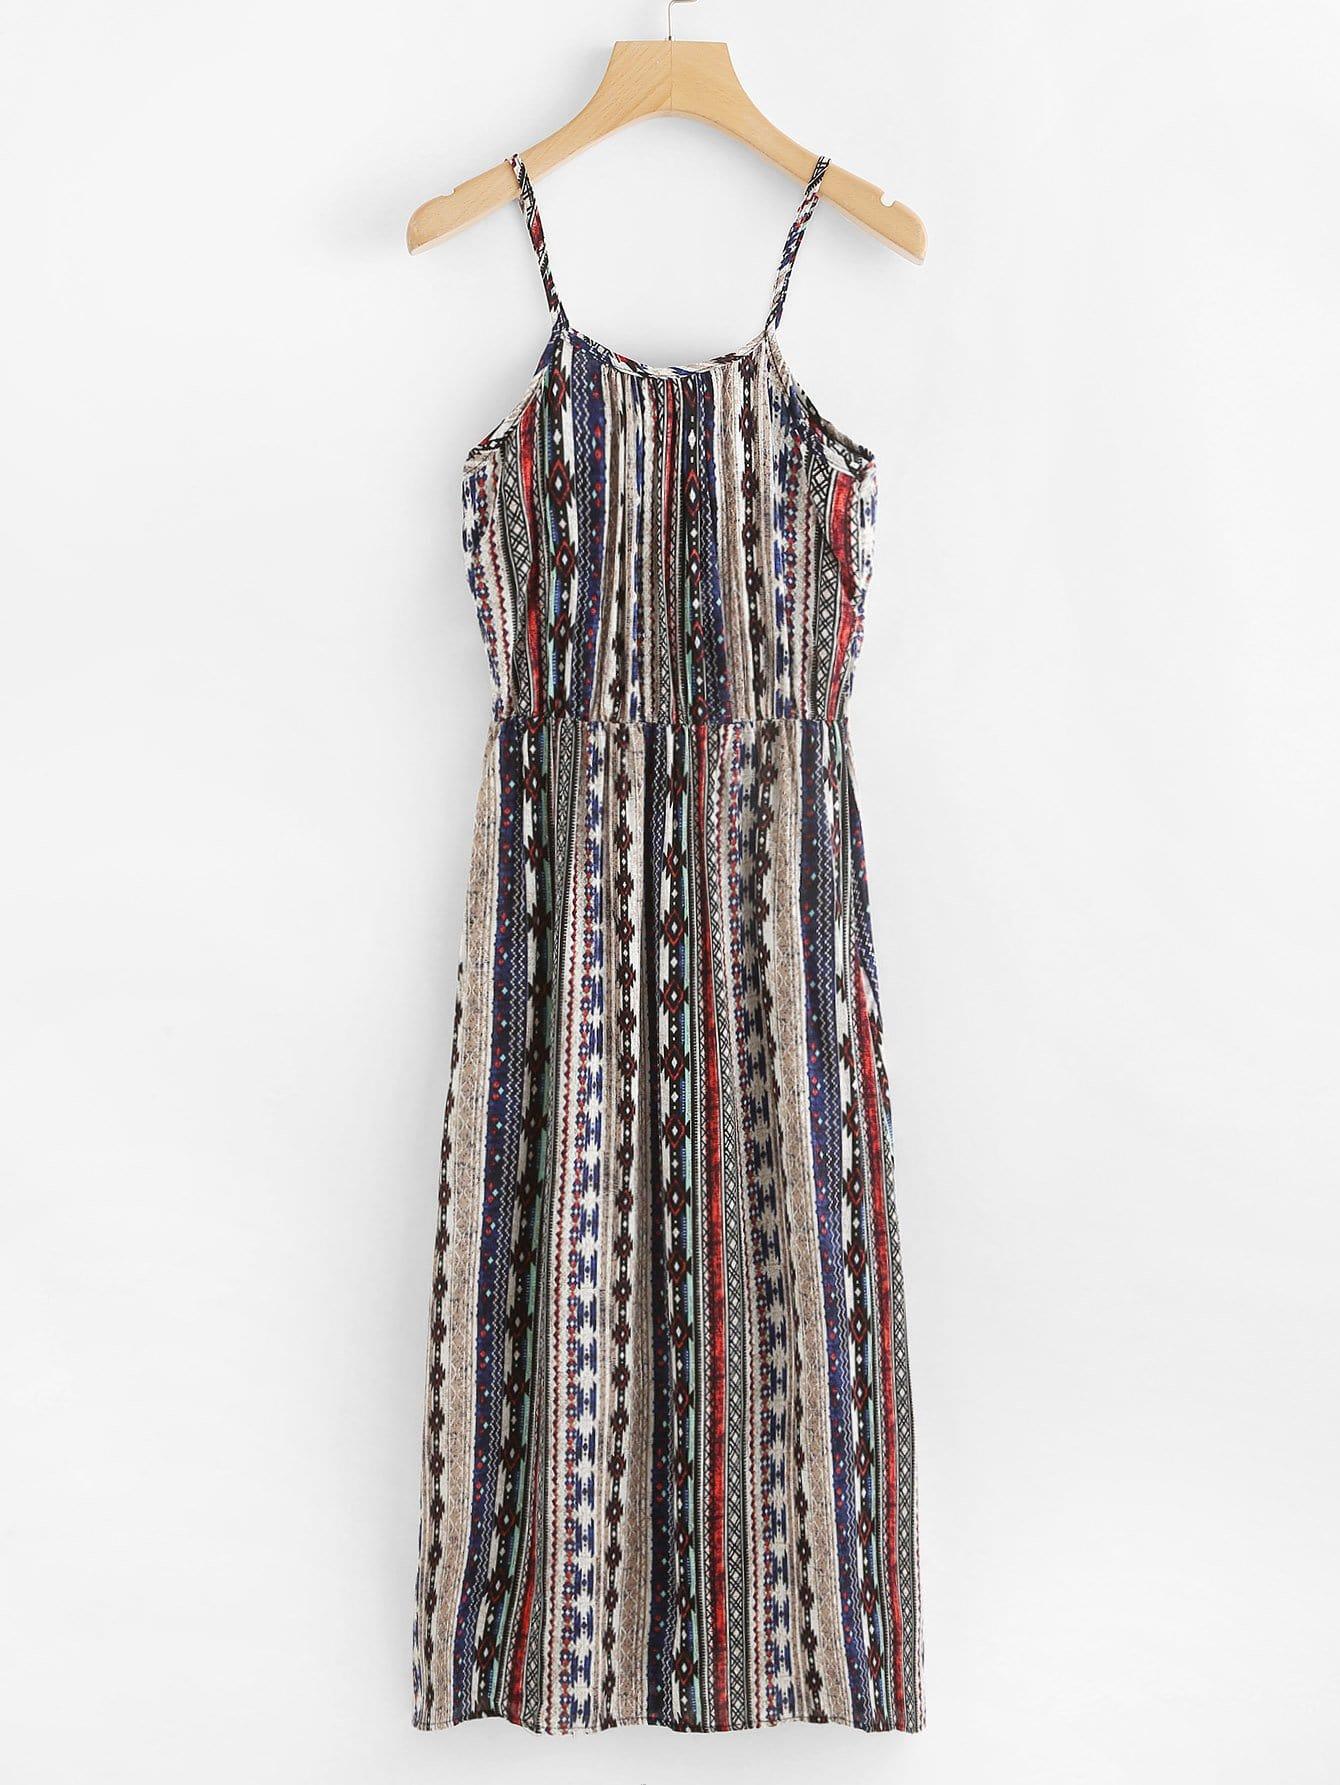 Tribal Print Cami Dress tribal print dress